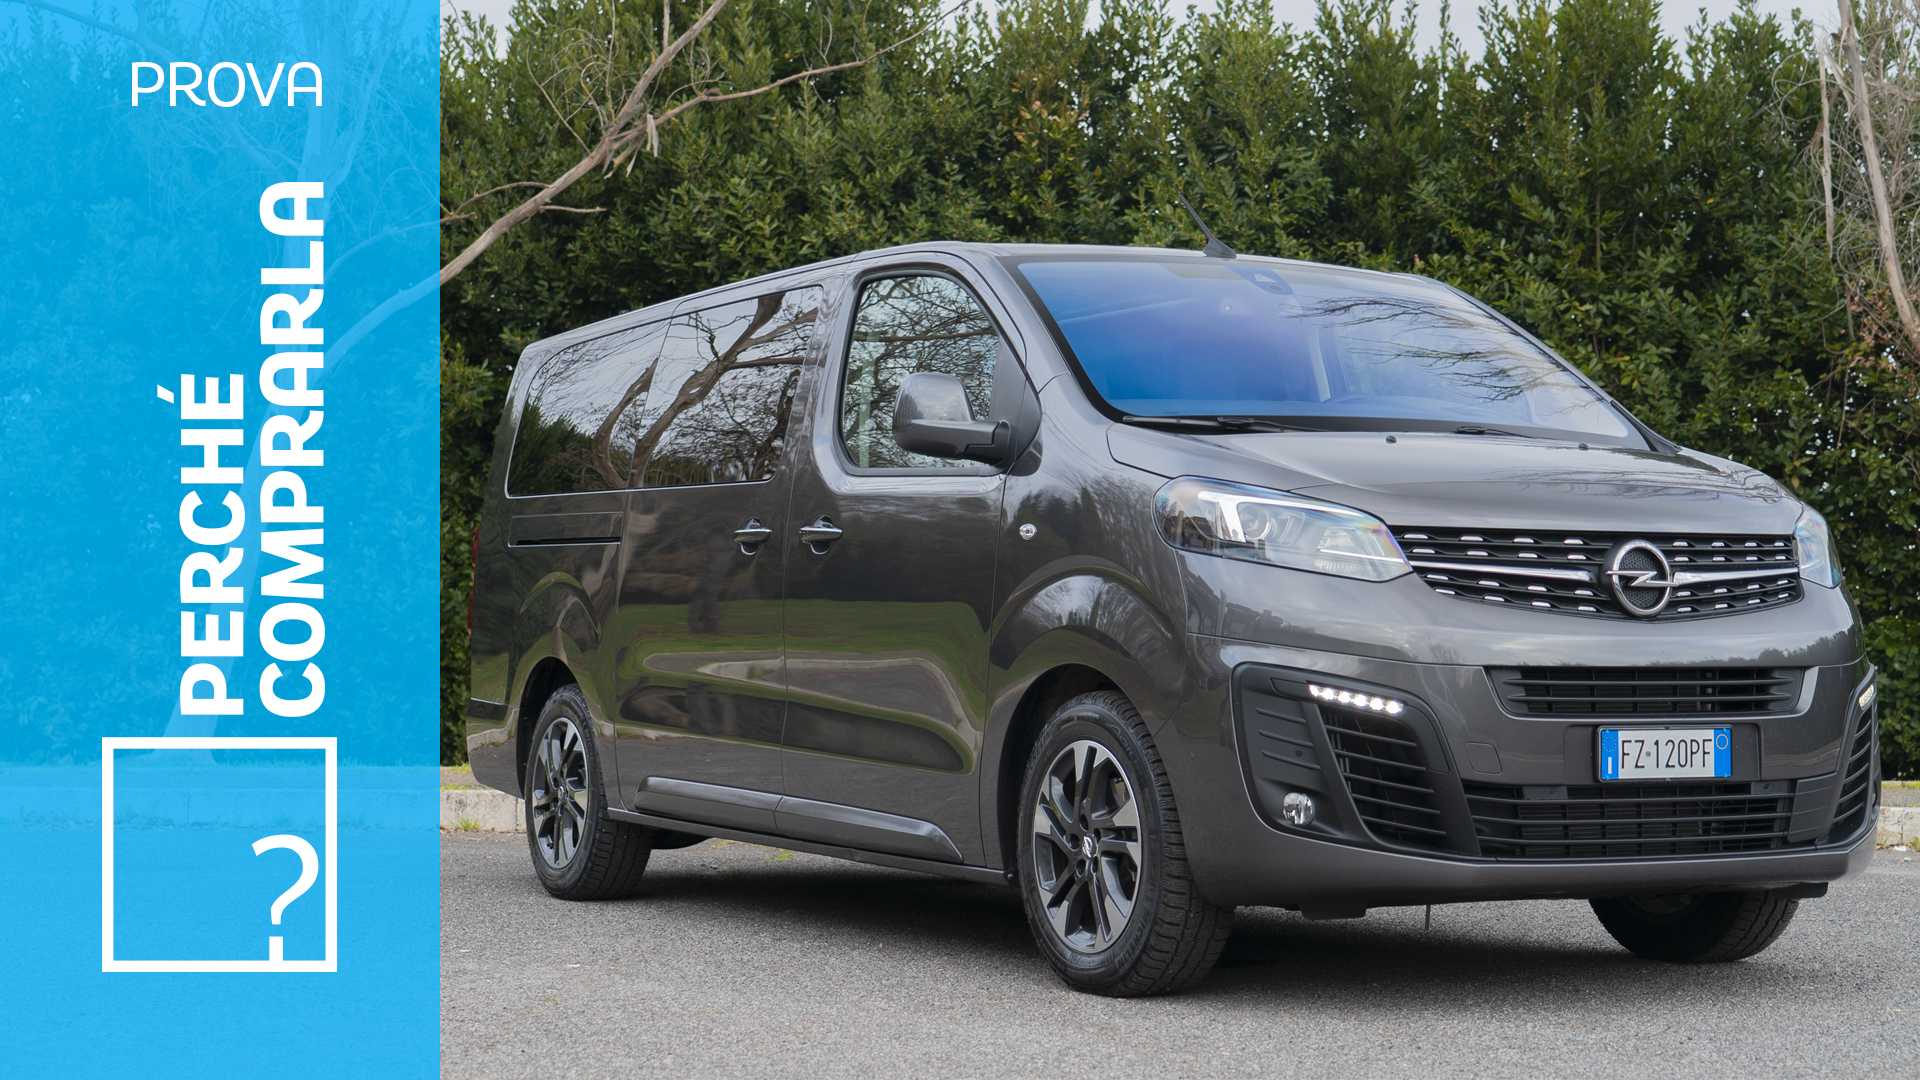 Opel Zafira Life, perché comprarla e perché no